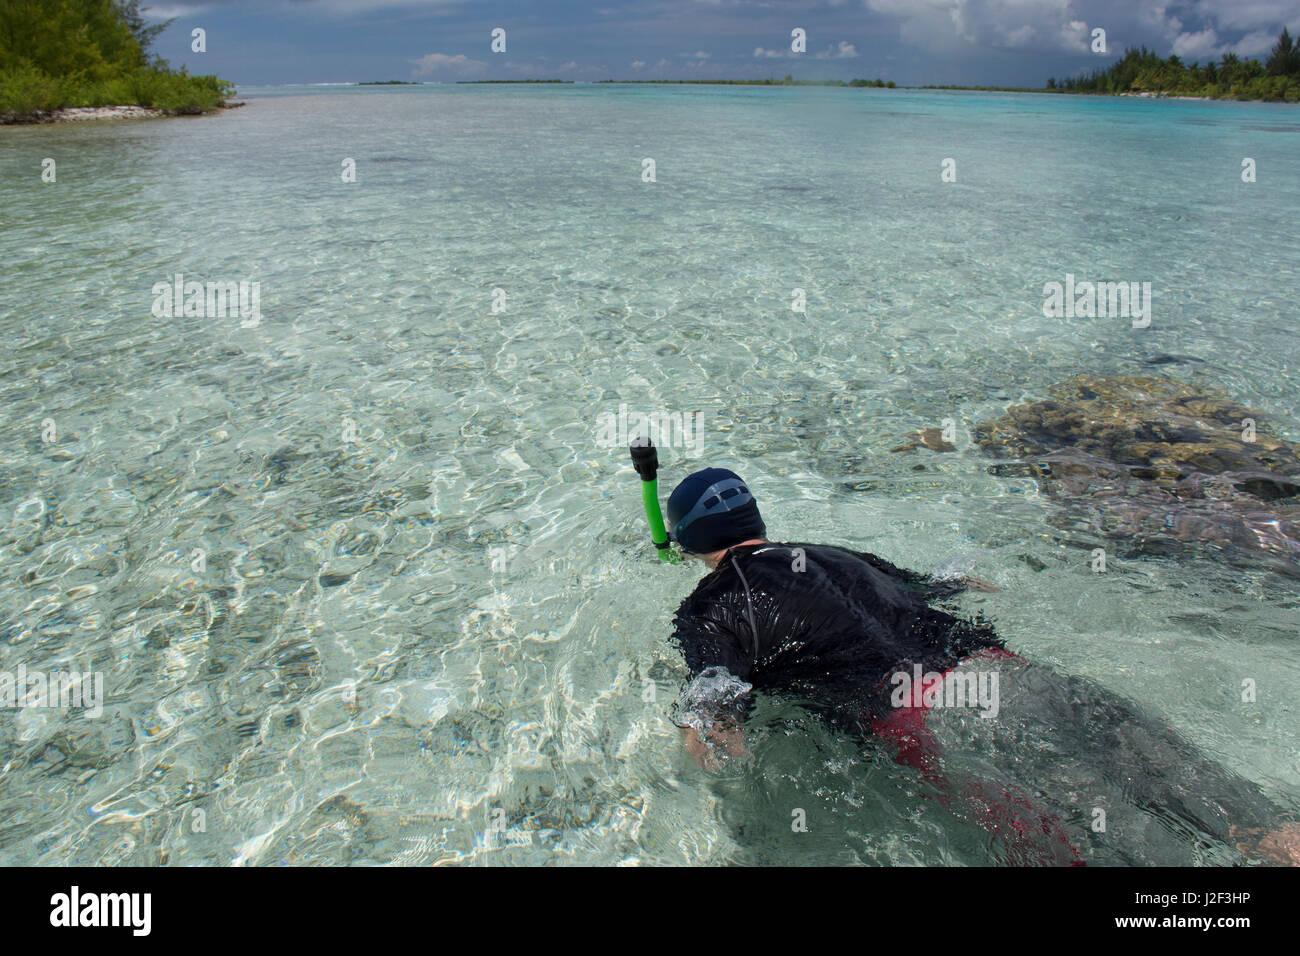 French Polynesia, Society Islands, Leeward Islands, Bora Bora. Haapiti, a small private island, aka motu. Shallow - Stock Image